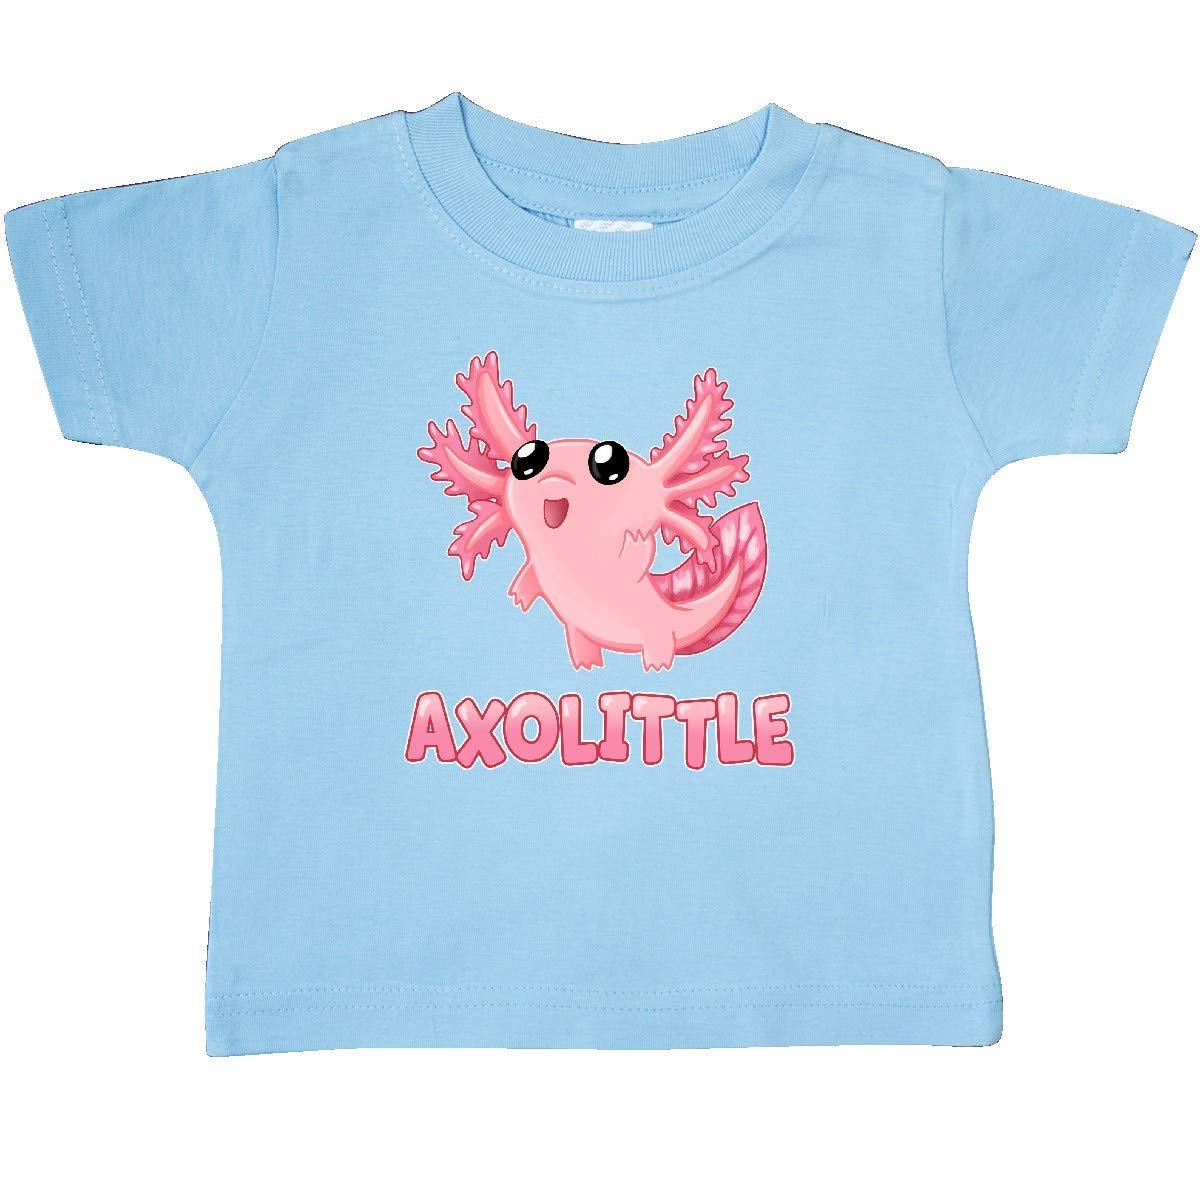 Cute Baby Axolotl Baby T-Shirt inktastic Axolittle